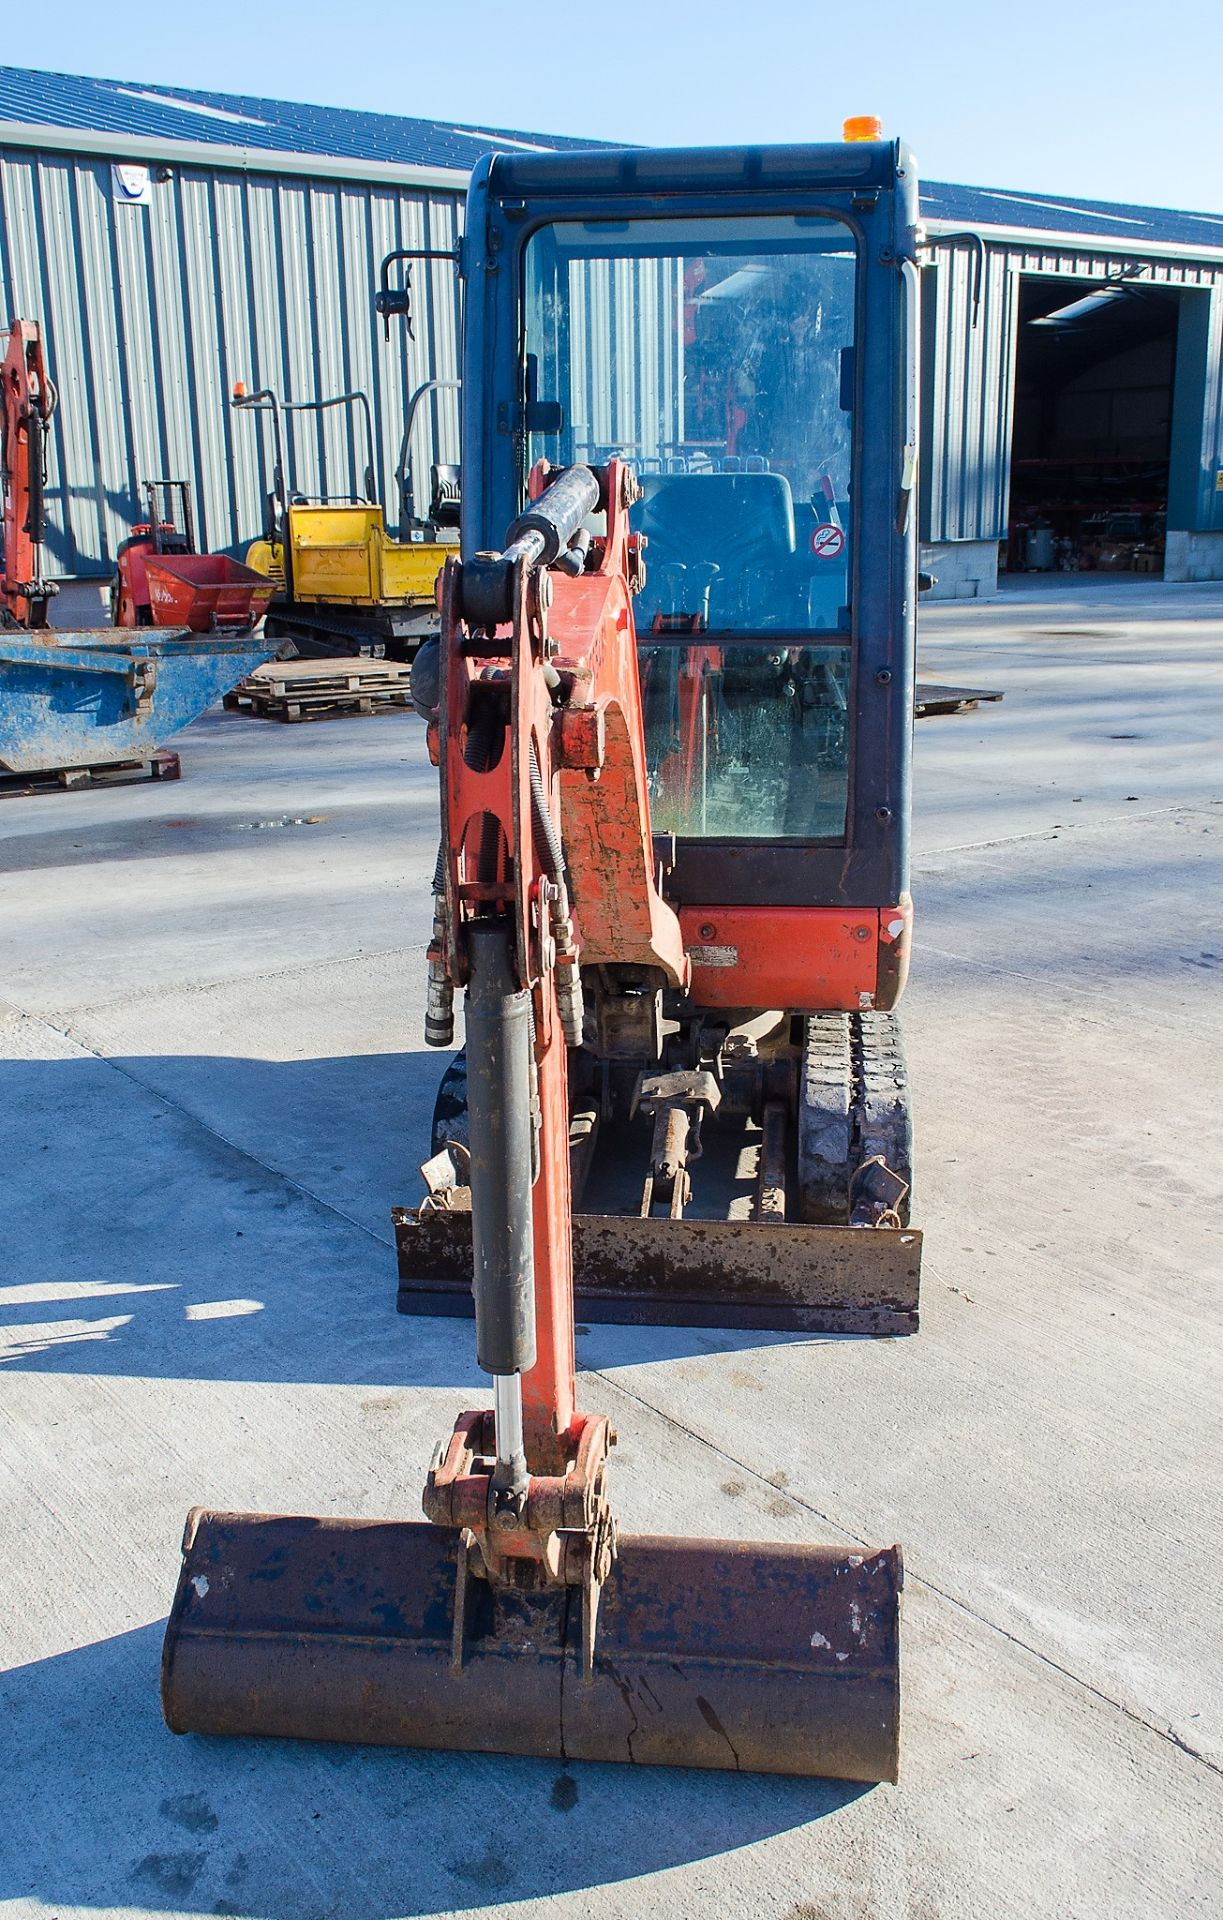 Kubota KX016-4 1.5 tonne rubber tracked mini excavator Year: 2015 S/N: 58688 Recorded Hours: 1736 - Image 5 of 19